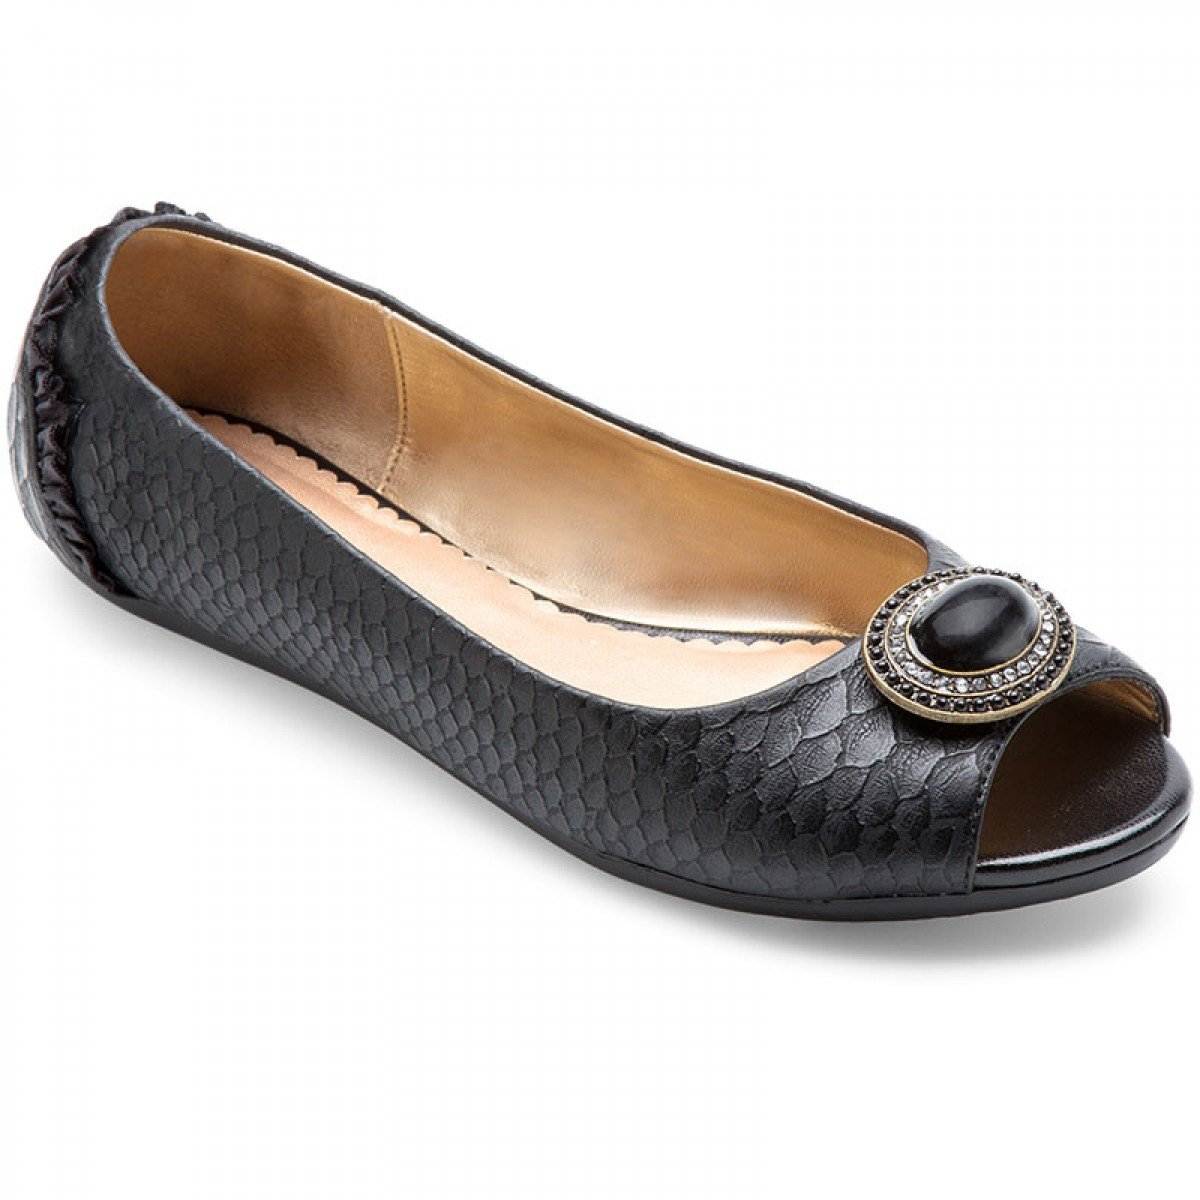 Lindsay Phillips Womens Kate Peep Toe Flat B008FO09D6 6.5 B(M) US|Black Python